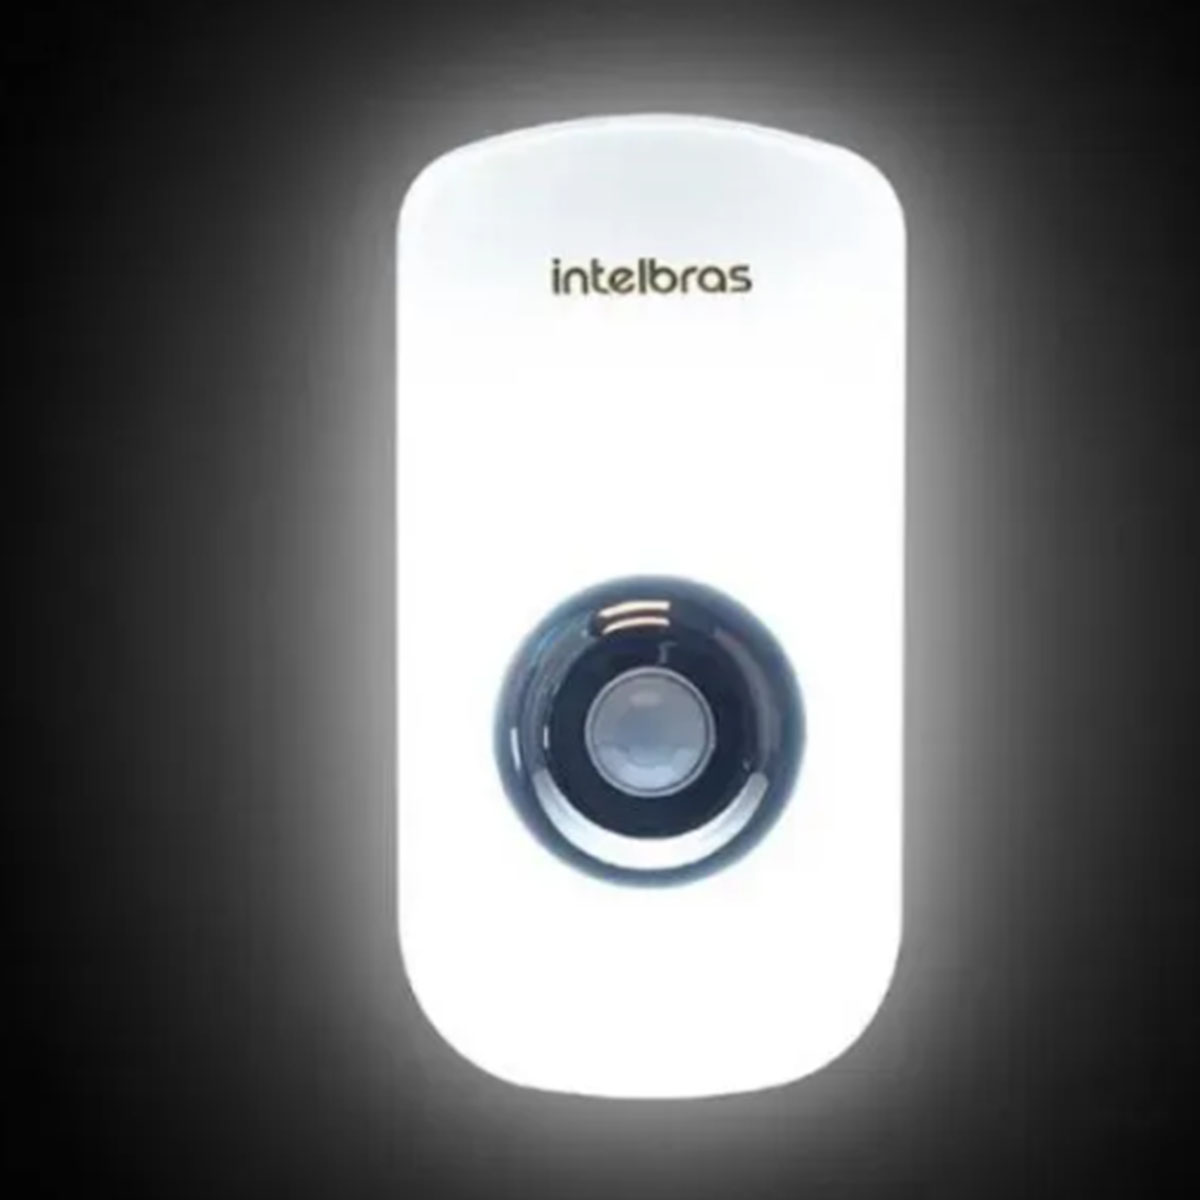 Kit 10 Luminária Intelbras Led c/ Sensor De Presença Esi 5002